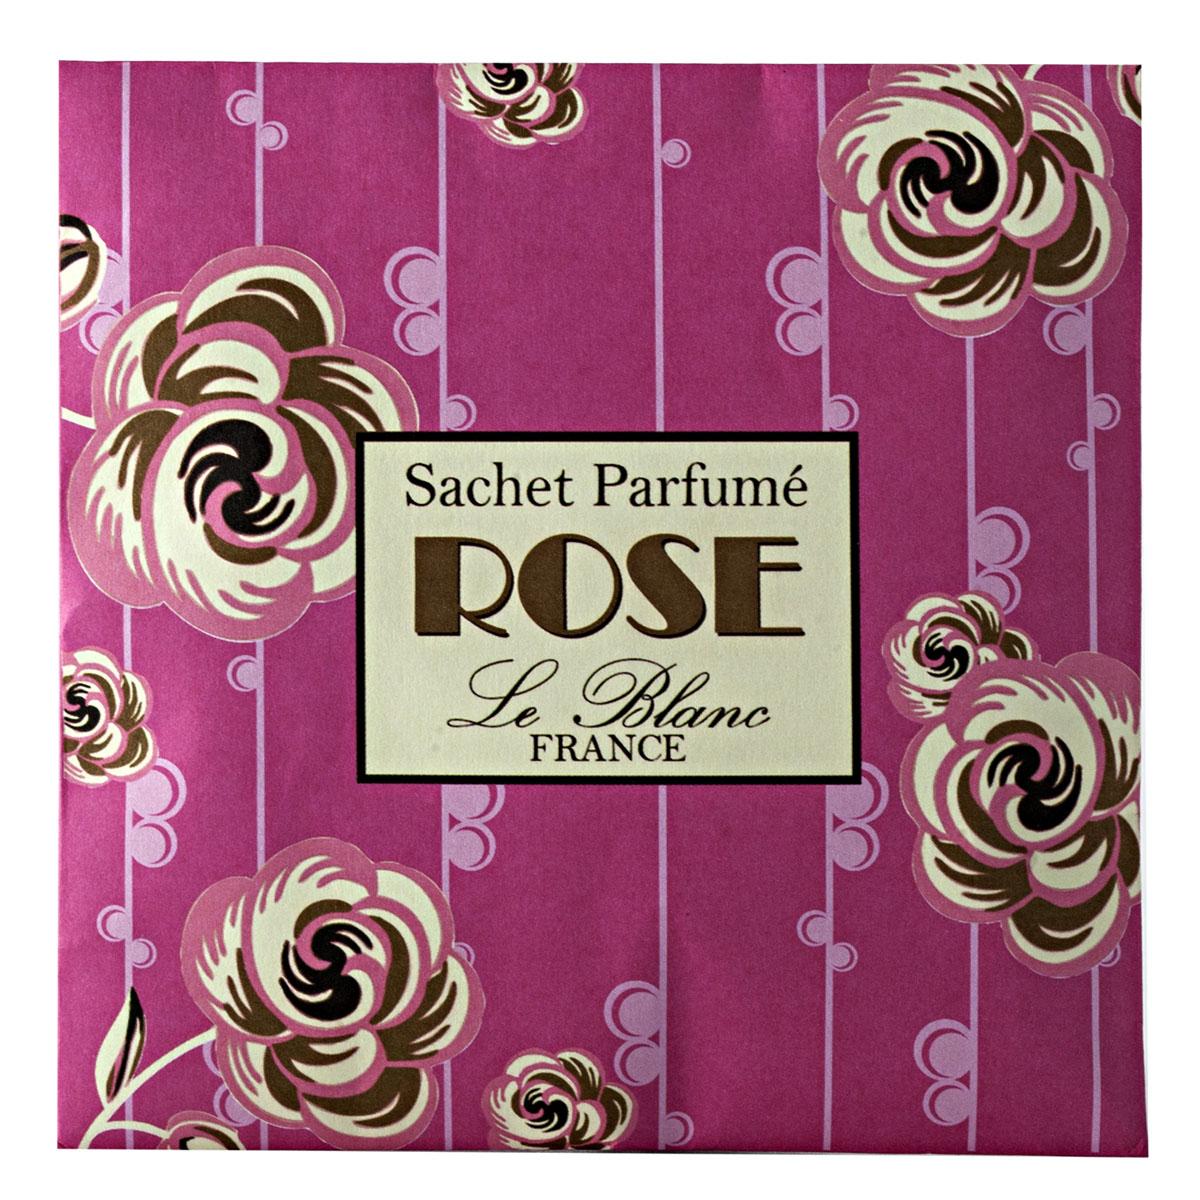 Саше Le Blanc Роза Стиль Арт Деко ароматерапия запах розы